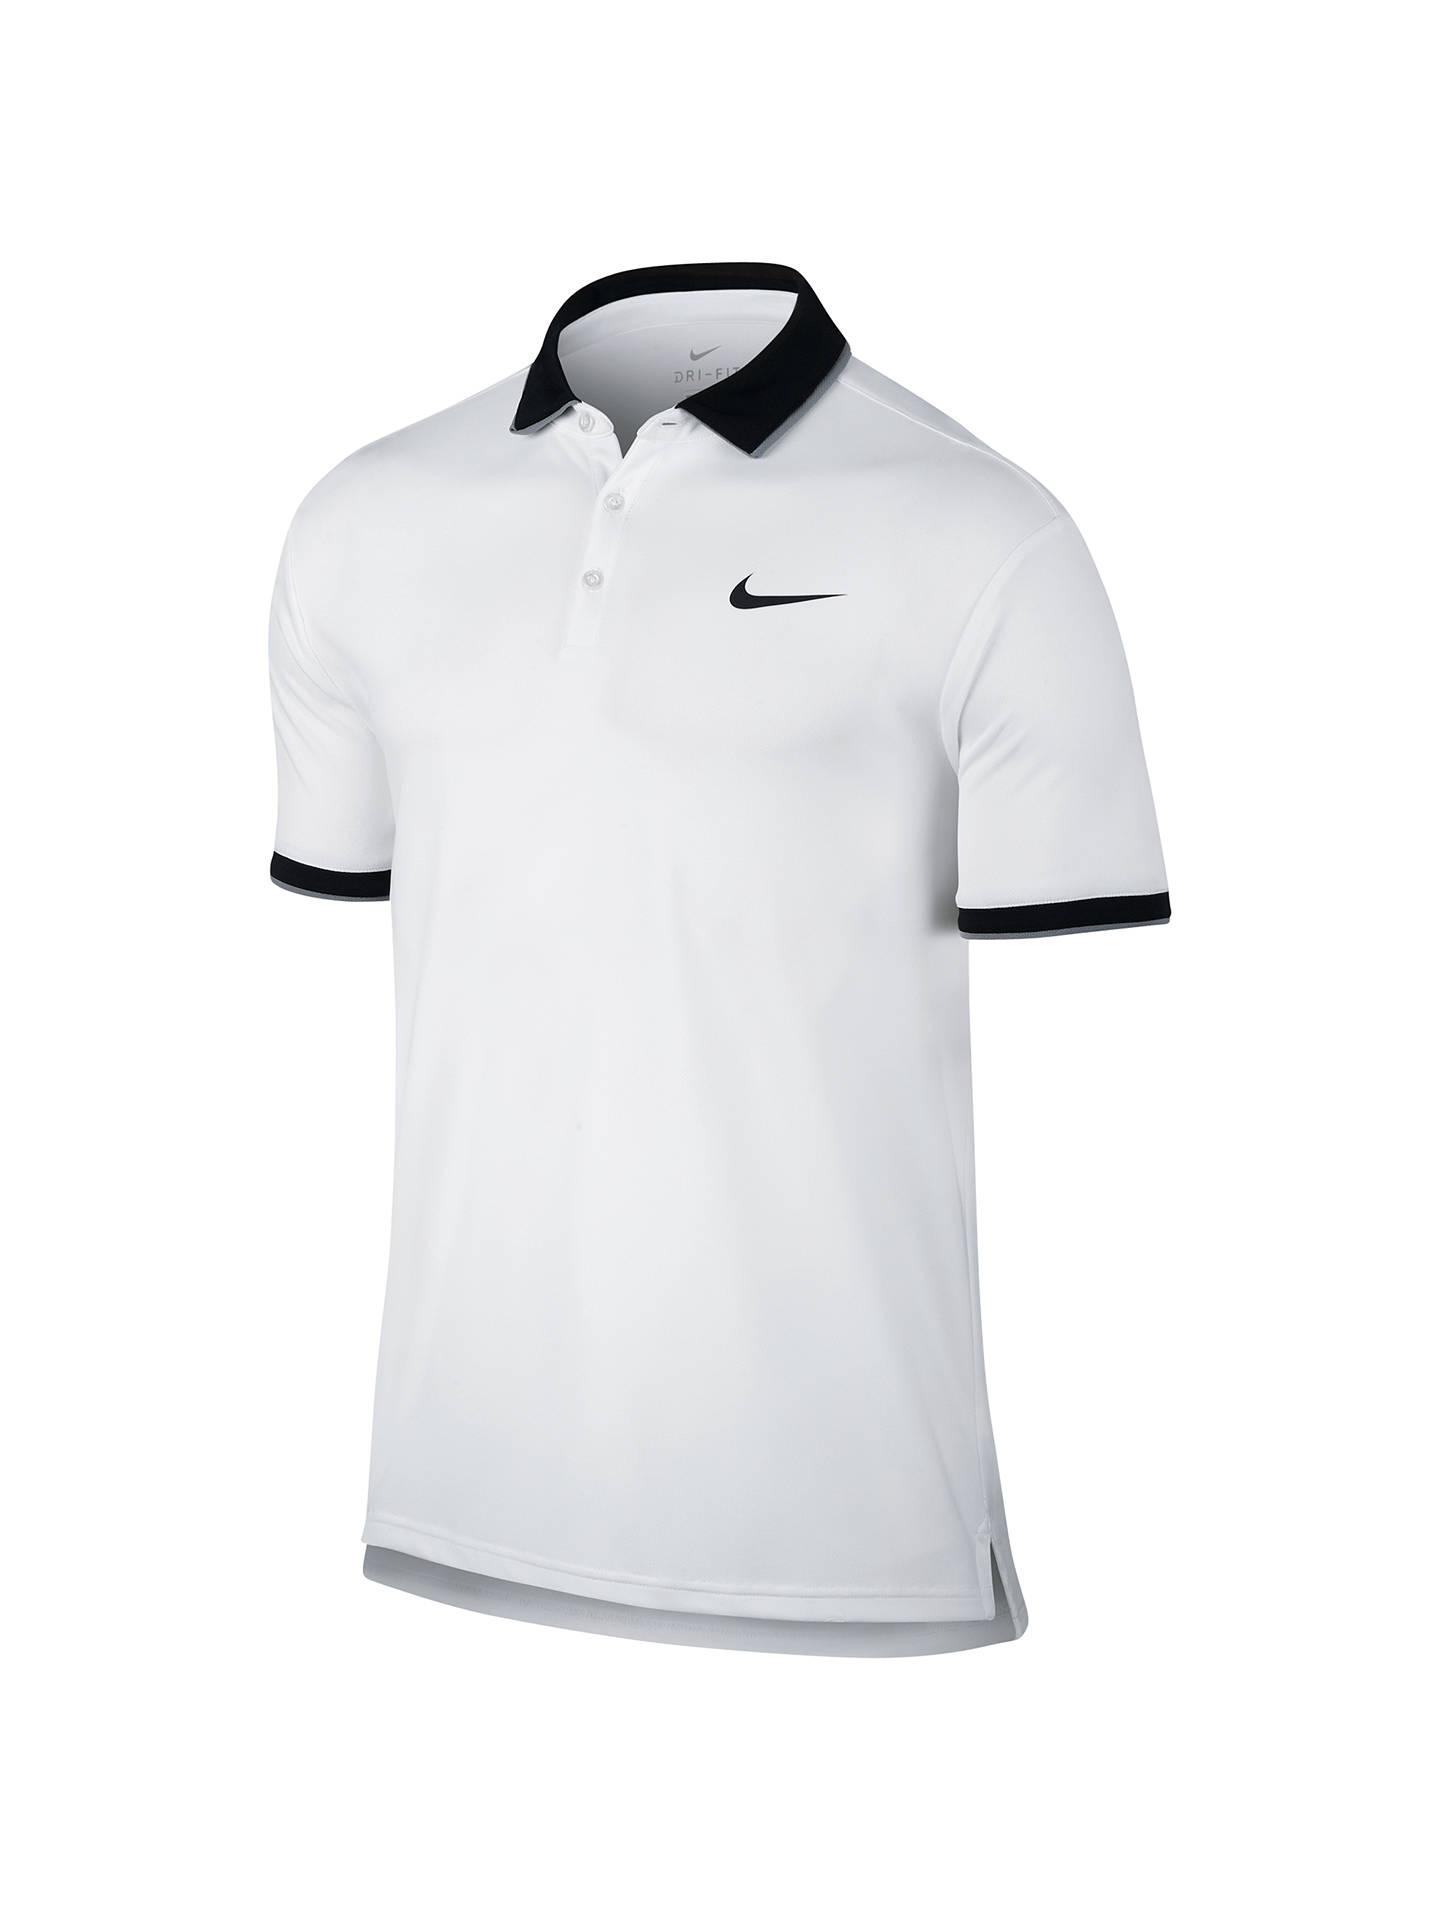 91c17939 Buy Nike Court Dry Tennis Polo Shirt, White/Black, S Online at johnlewis ...